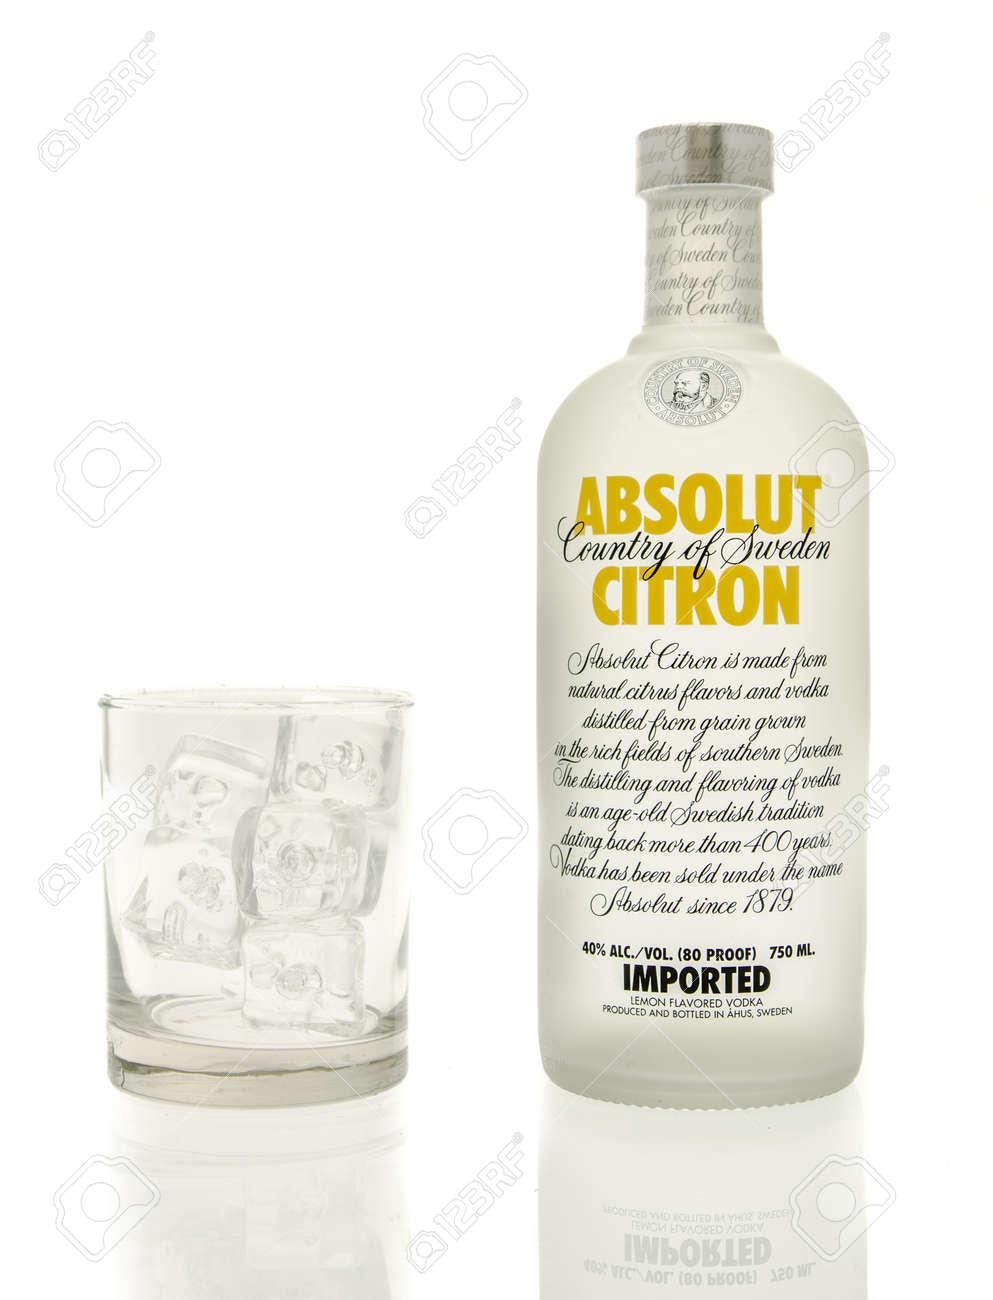 Winneconne, WI - 15 March 2016: A bottle of Absolut citron vodka